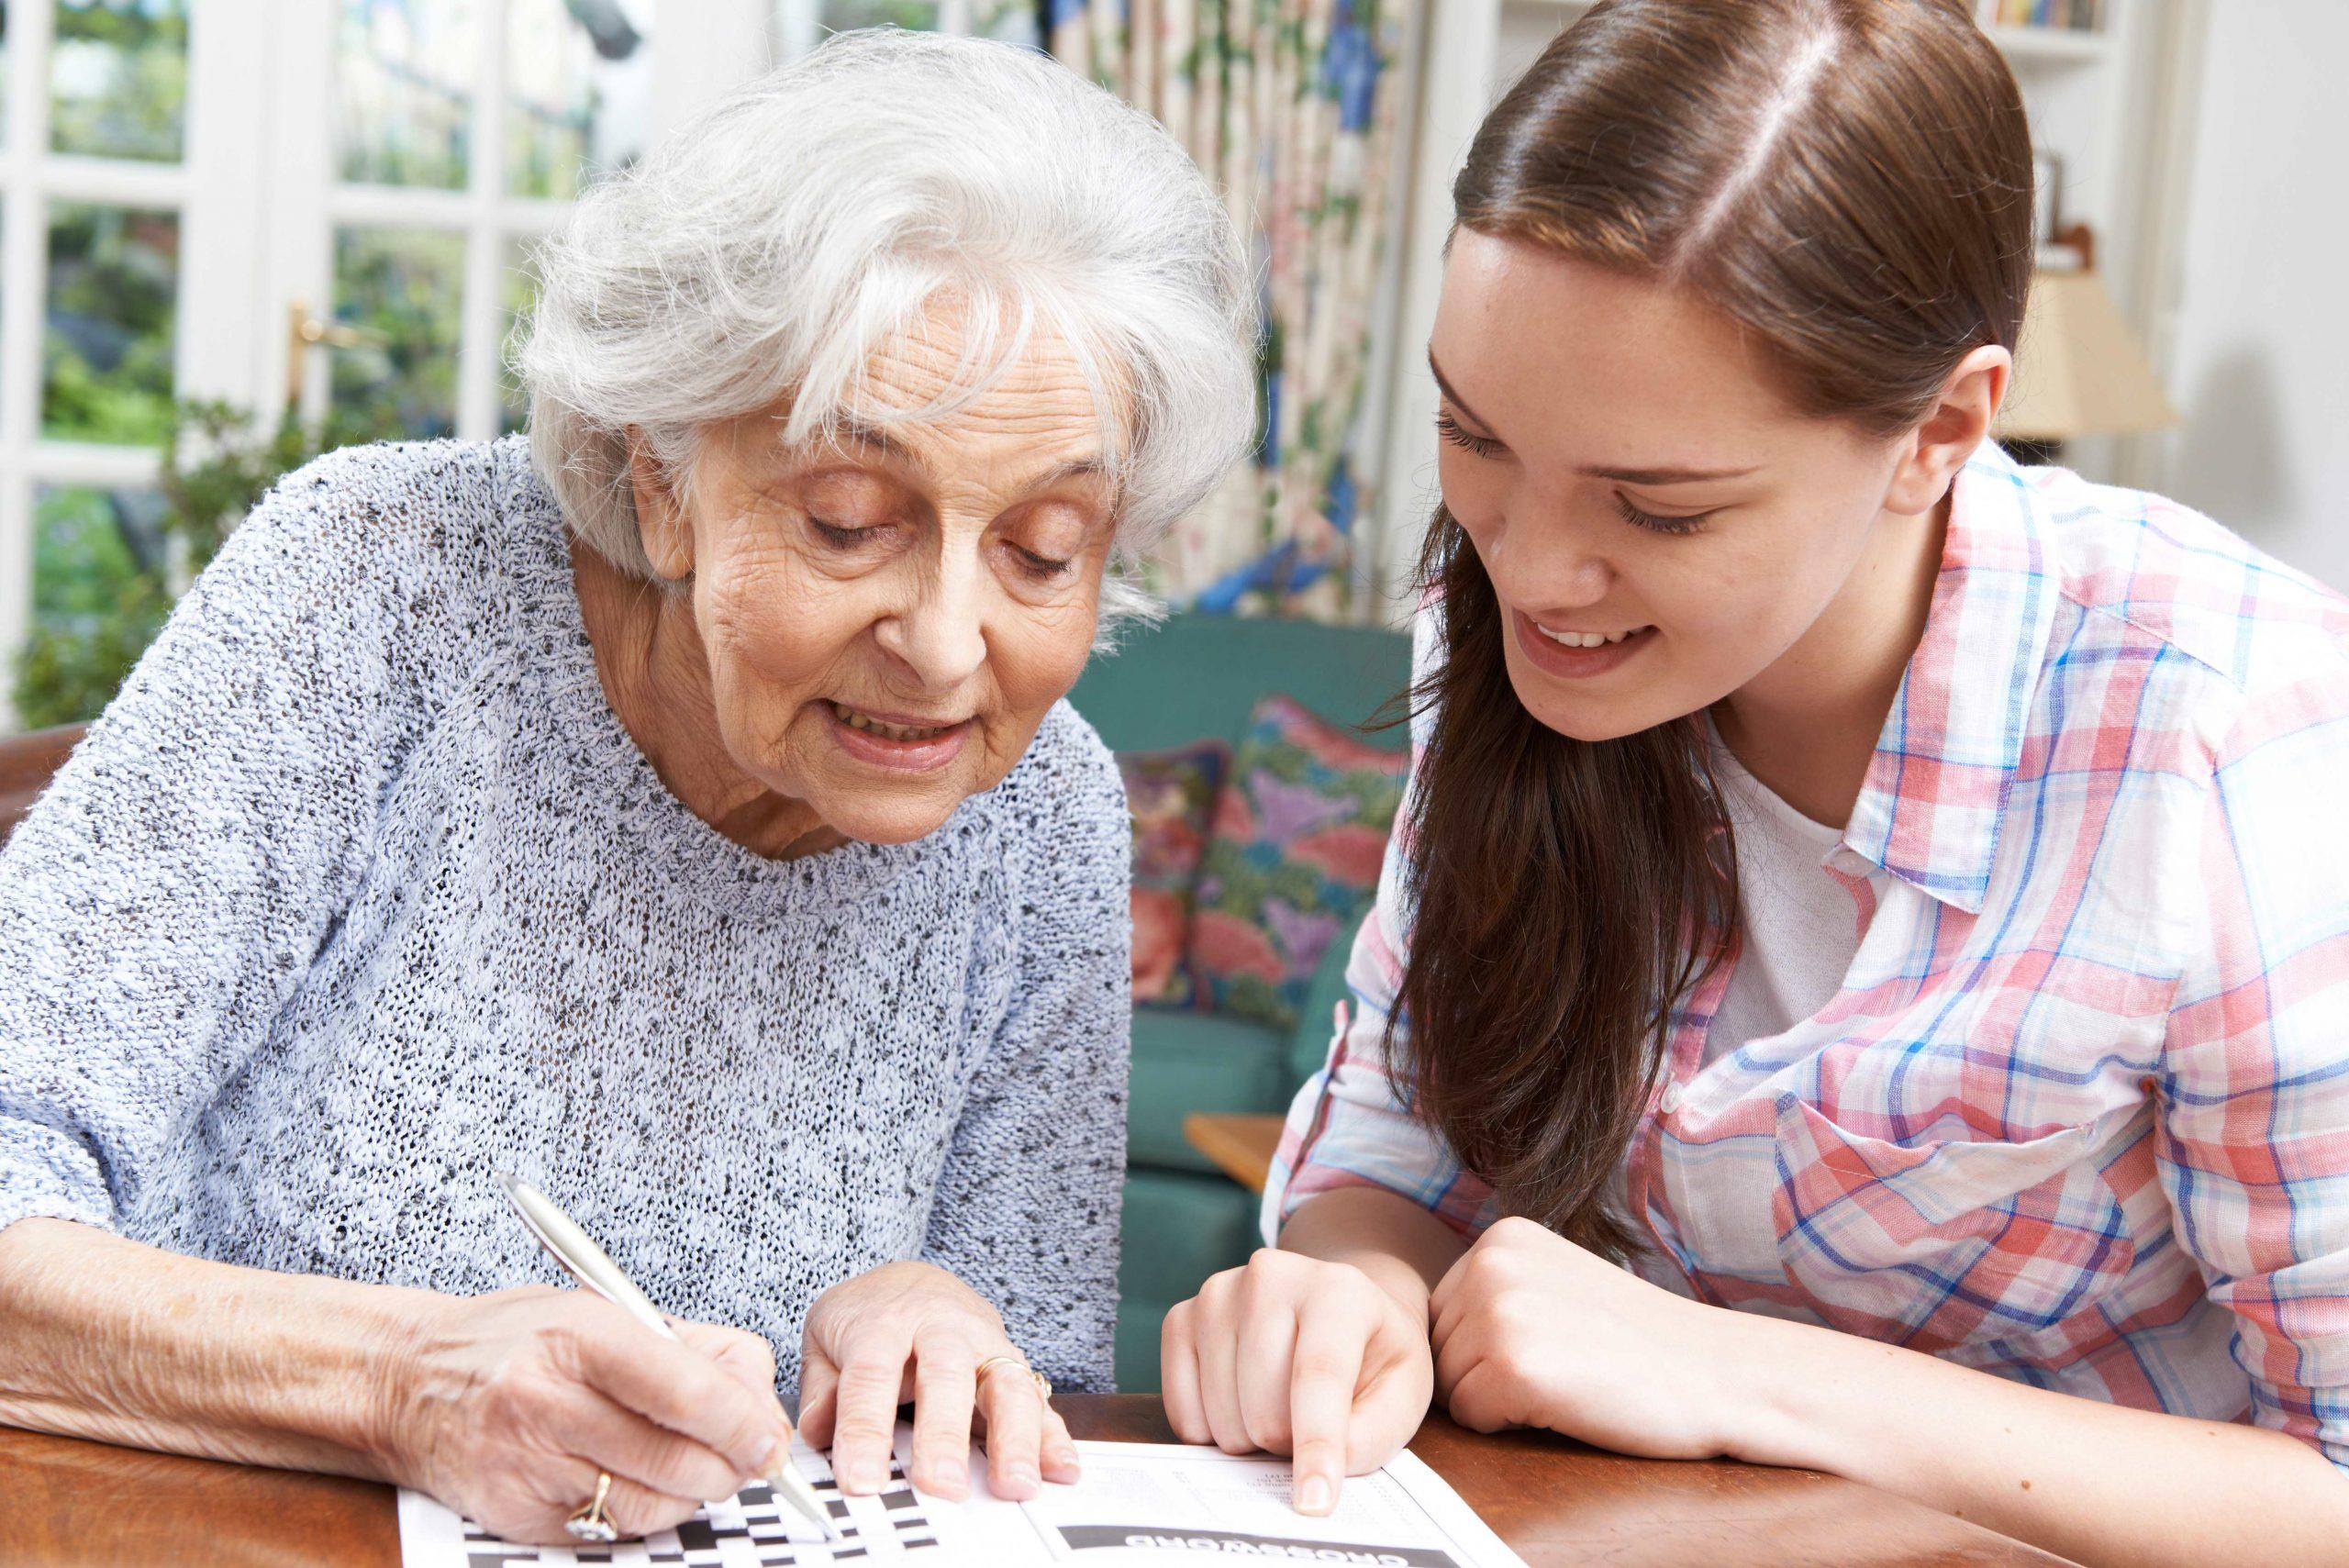 regole per prevenire l'Alzheimer